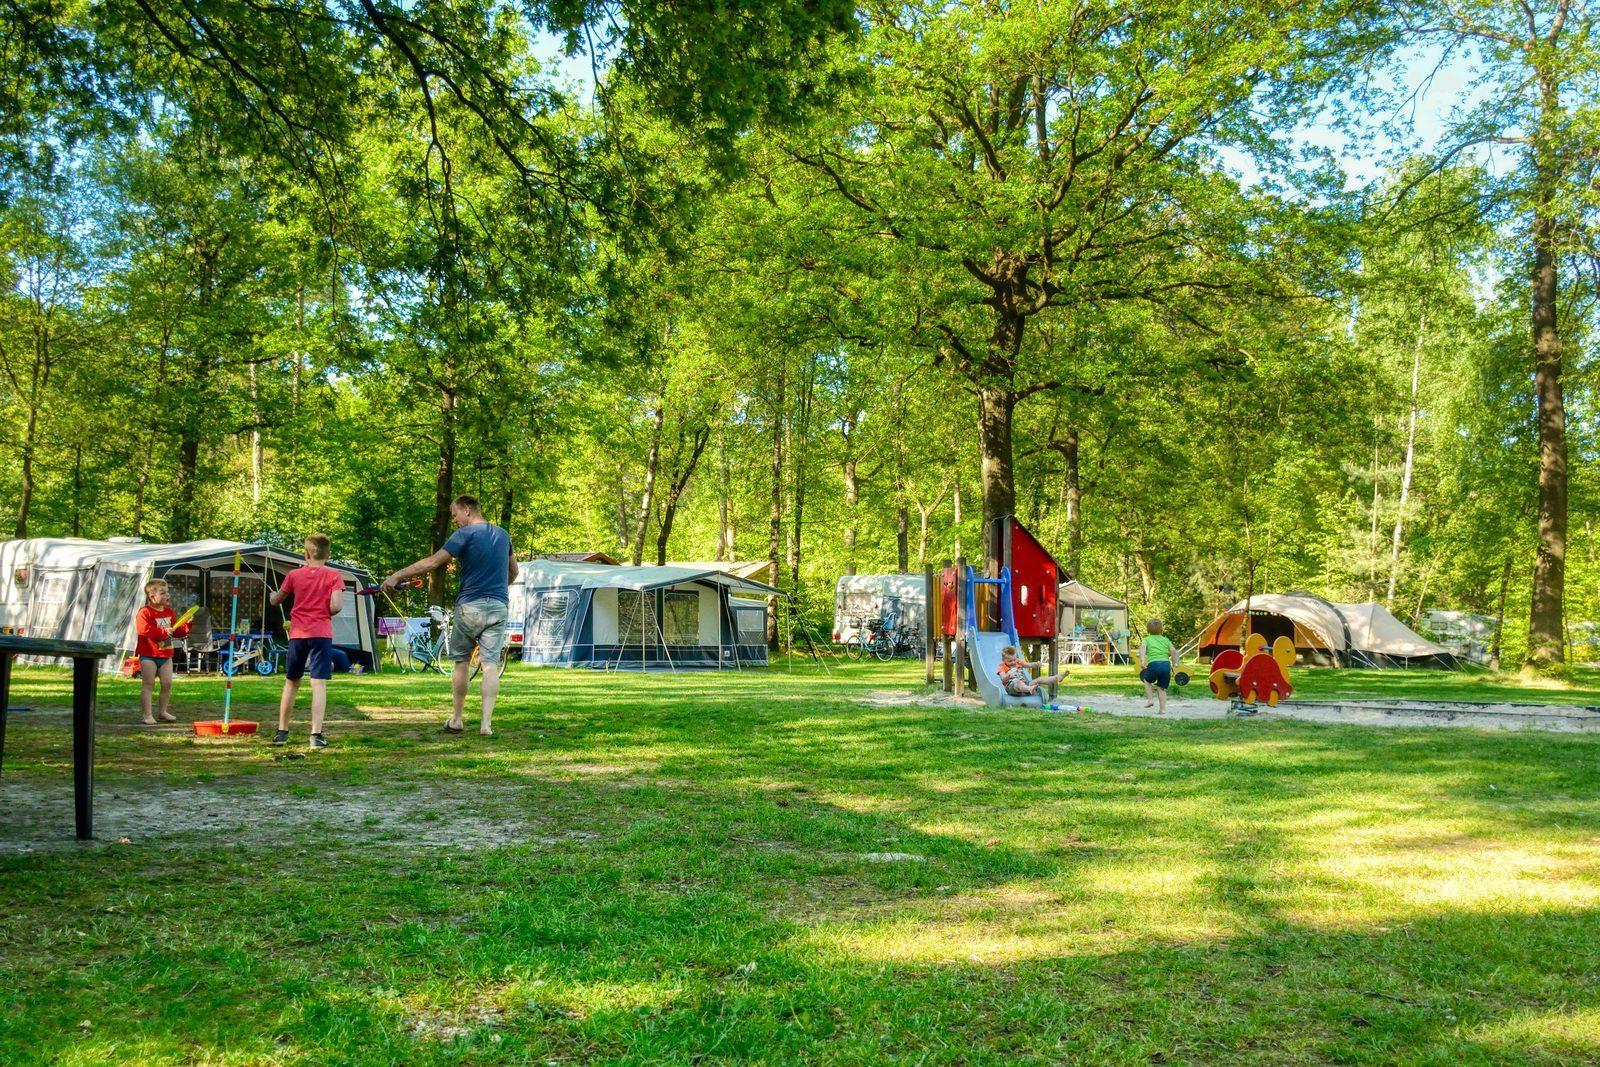 Campsite in Berenkuil | 5-star campsite in Drenthe